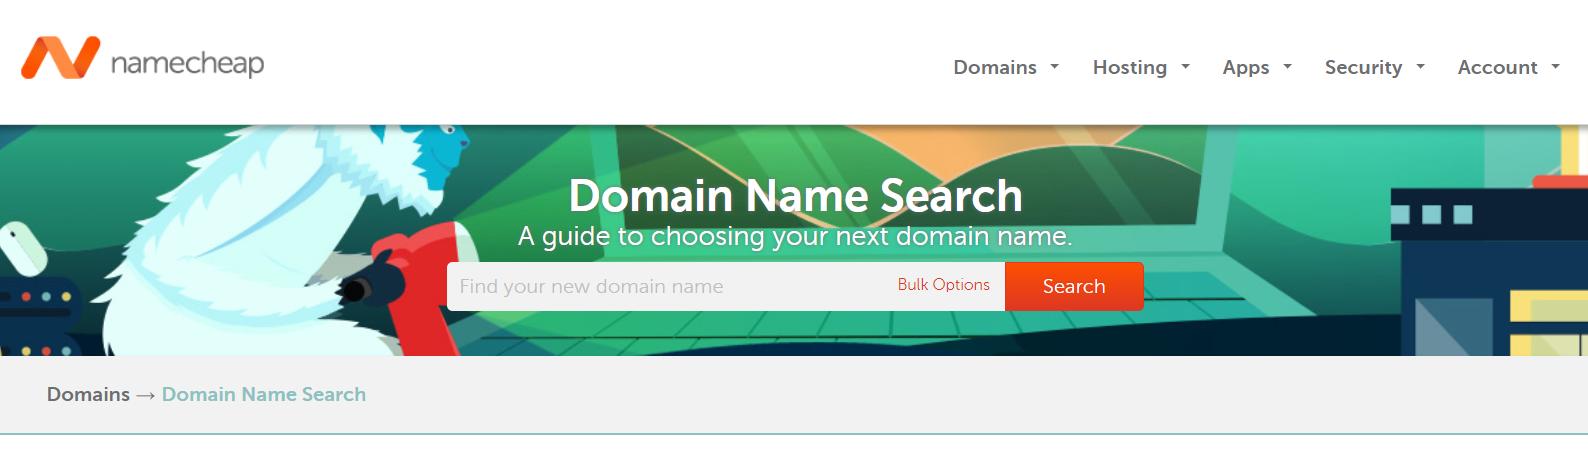 Namecheap Domain Name Search | HollyPryce.com